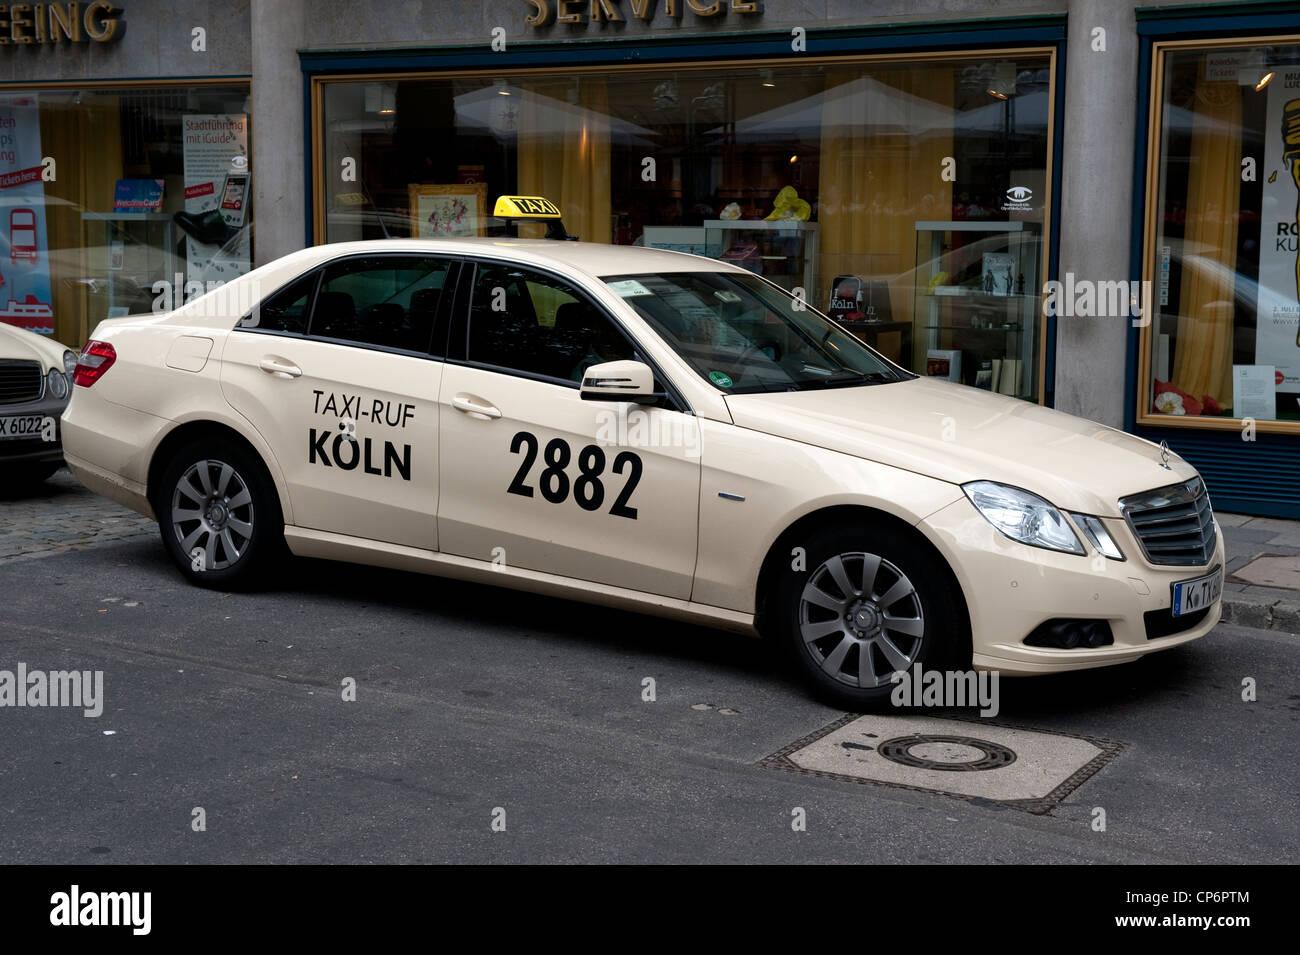 koln 2882 taxi cab mercedes car cologne germany europe eu stock photo royalty free image. Black Bedroom Furniture Sets. Home Design Ideas